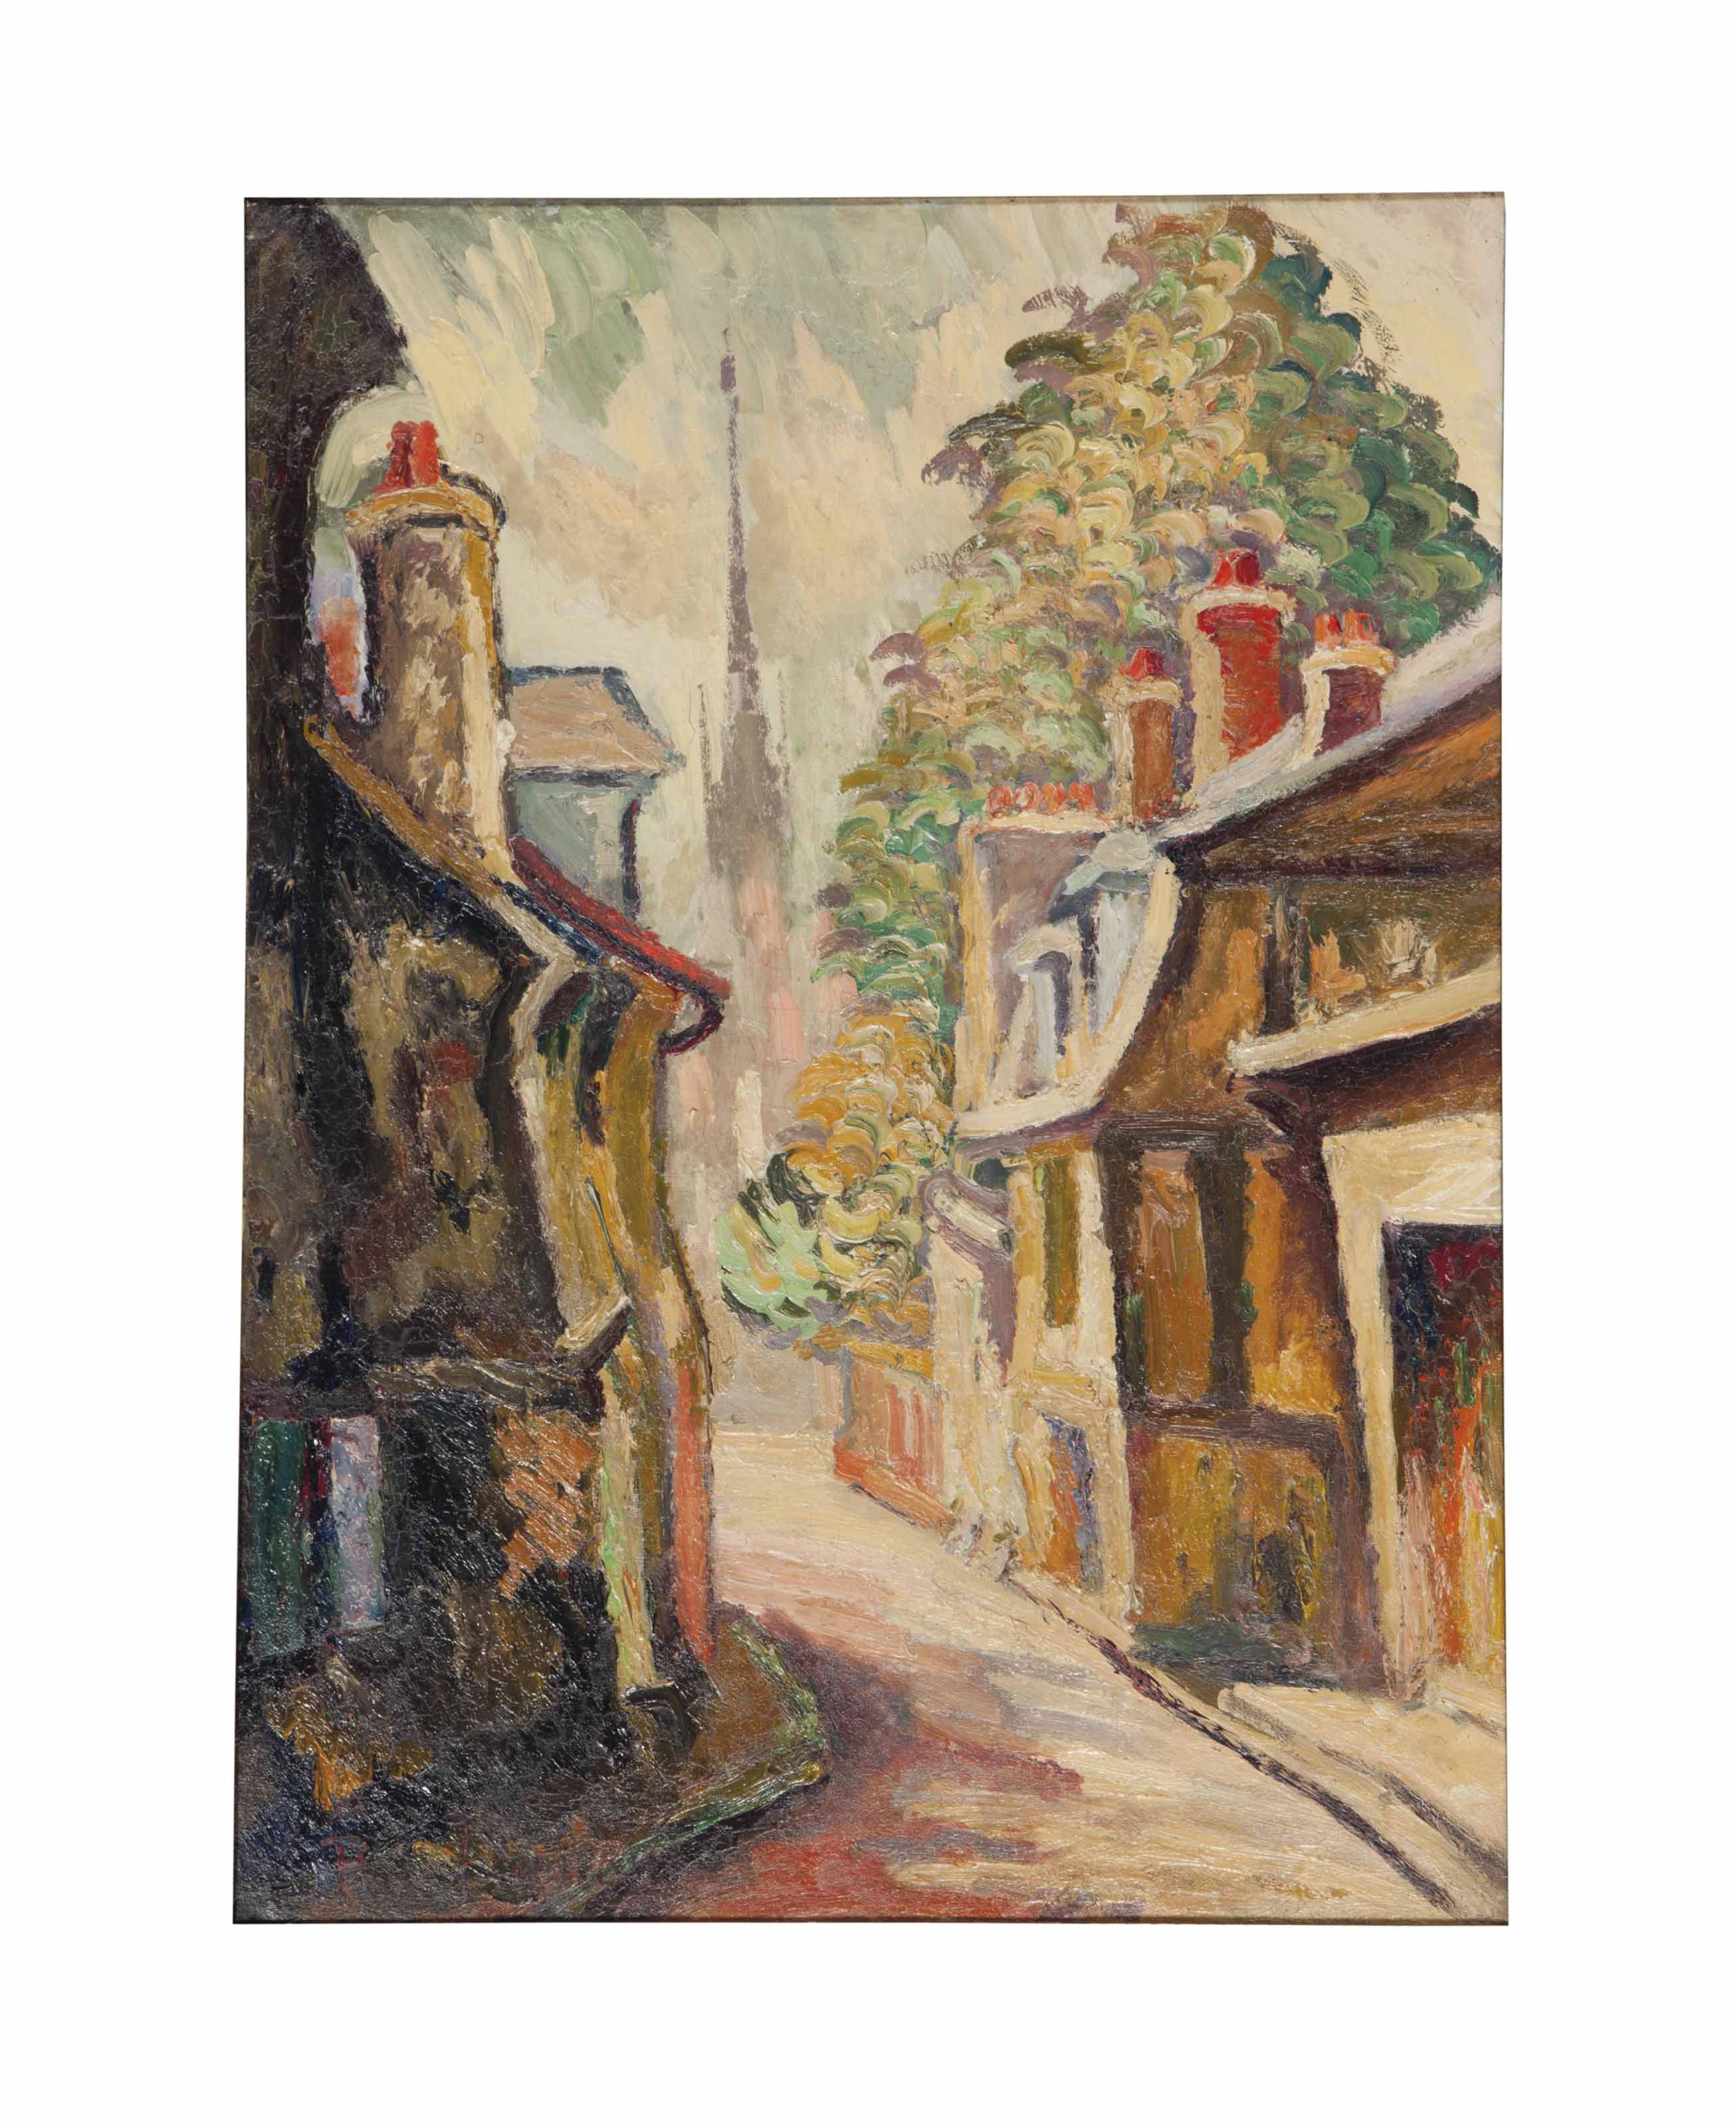 Pierre Dumont (French, 1884-1936)